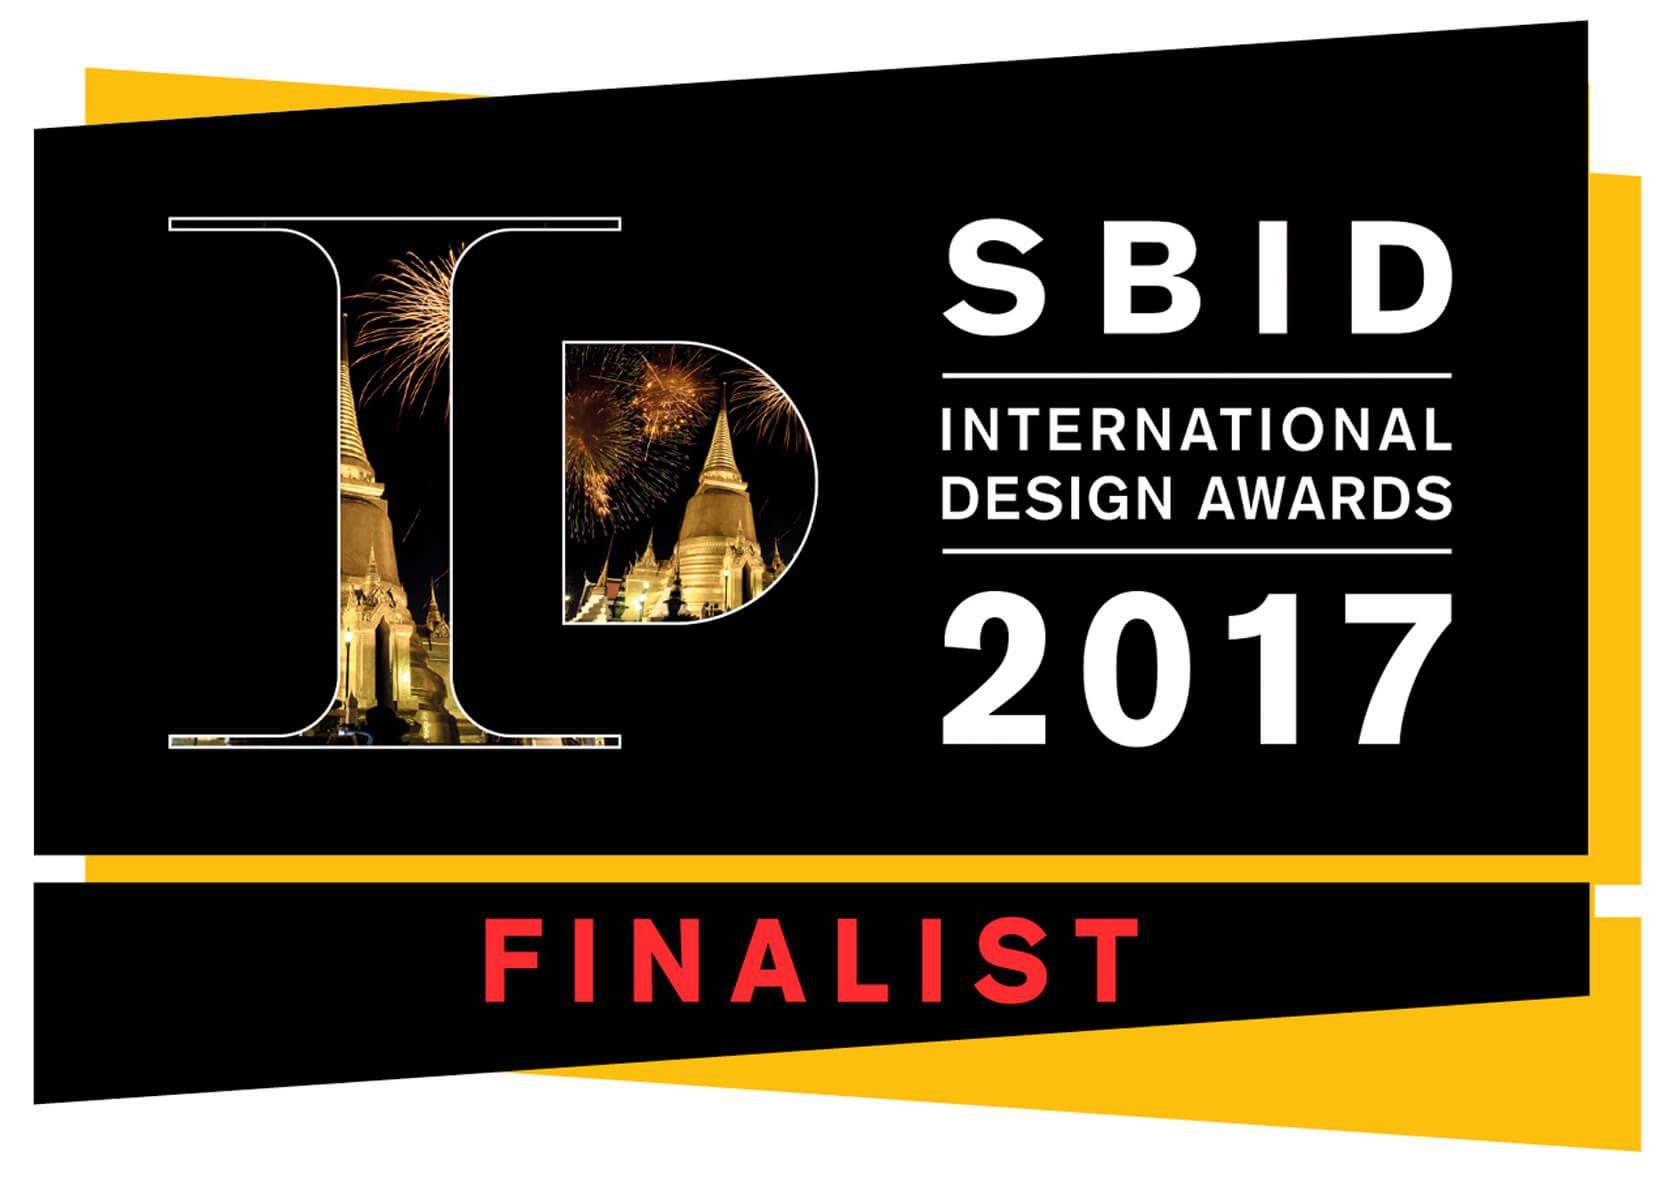 SBID Finalist 2017